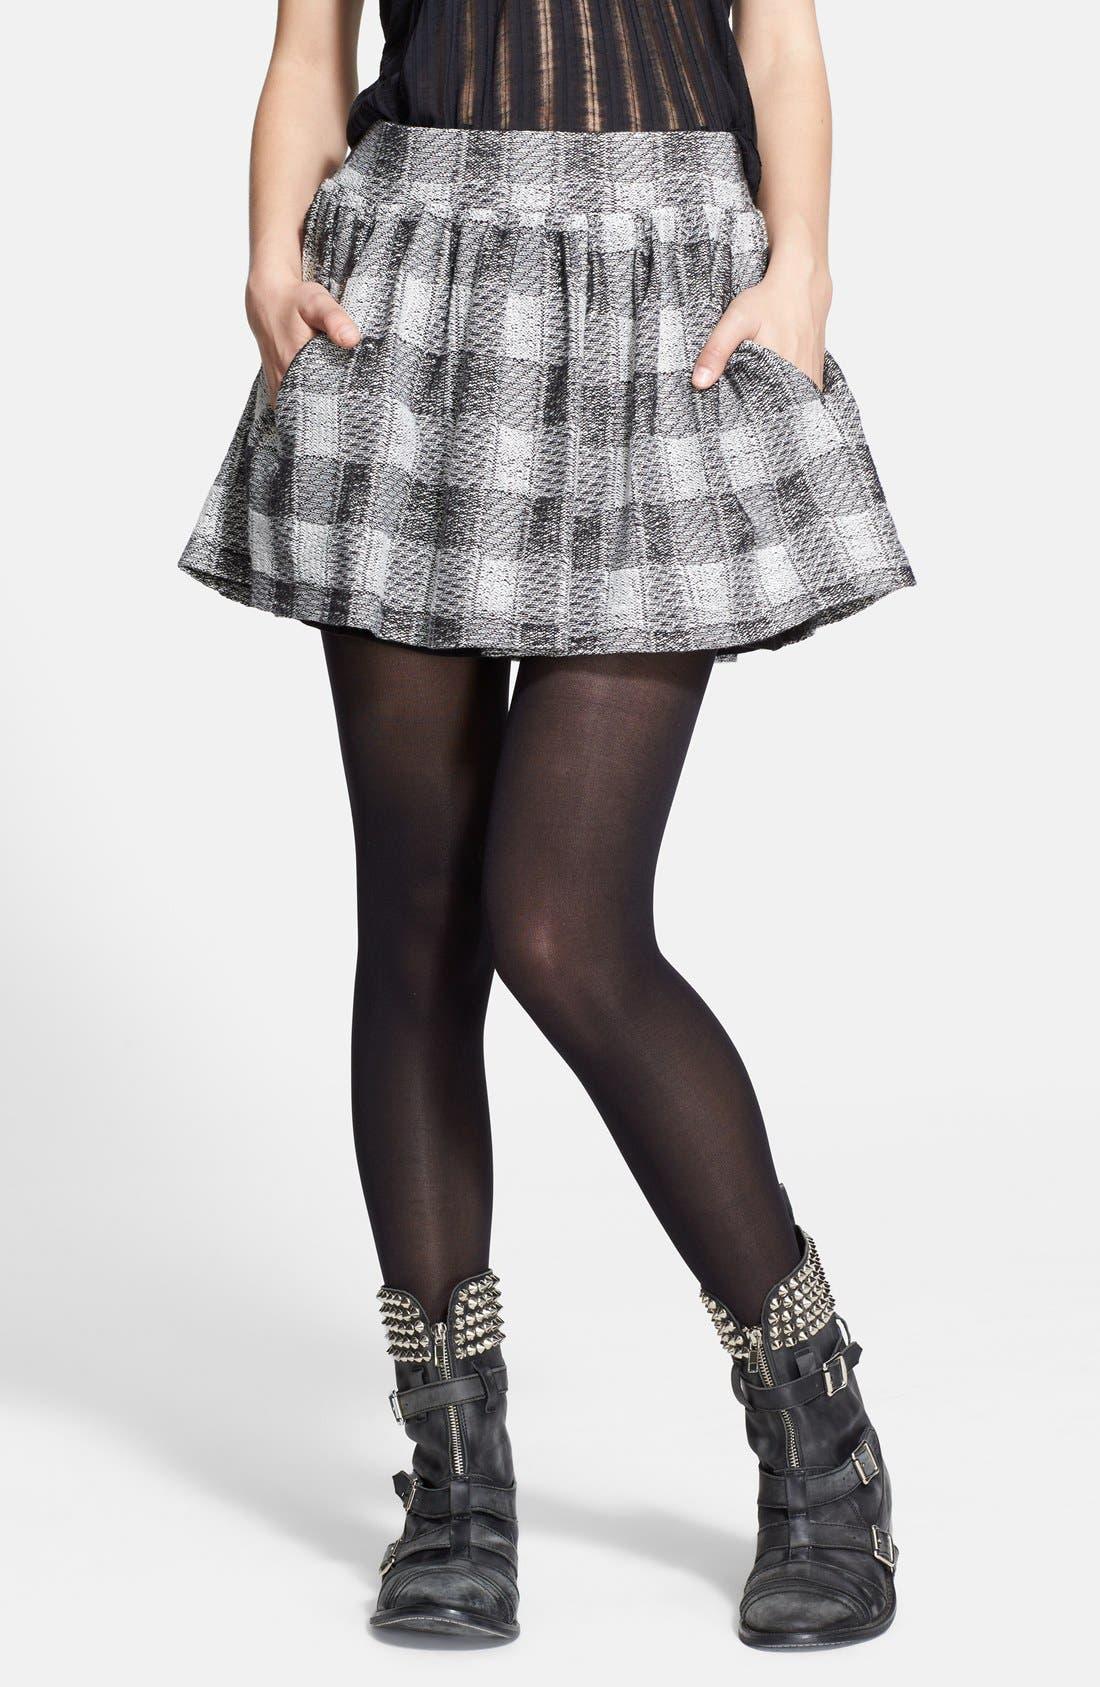 FREE PEOPLE, Plaid Flared Miniskirt, Main thumbnail 1, color, 001